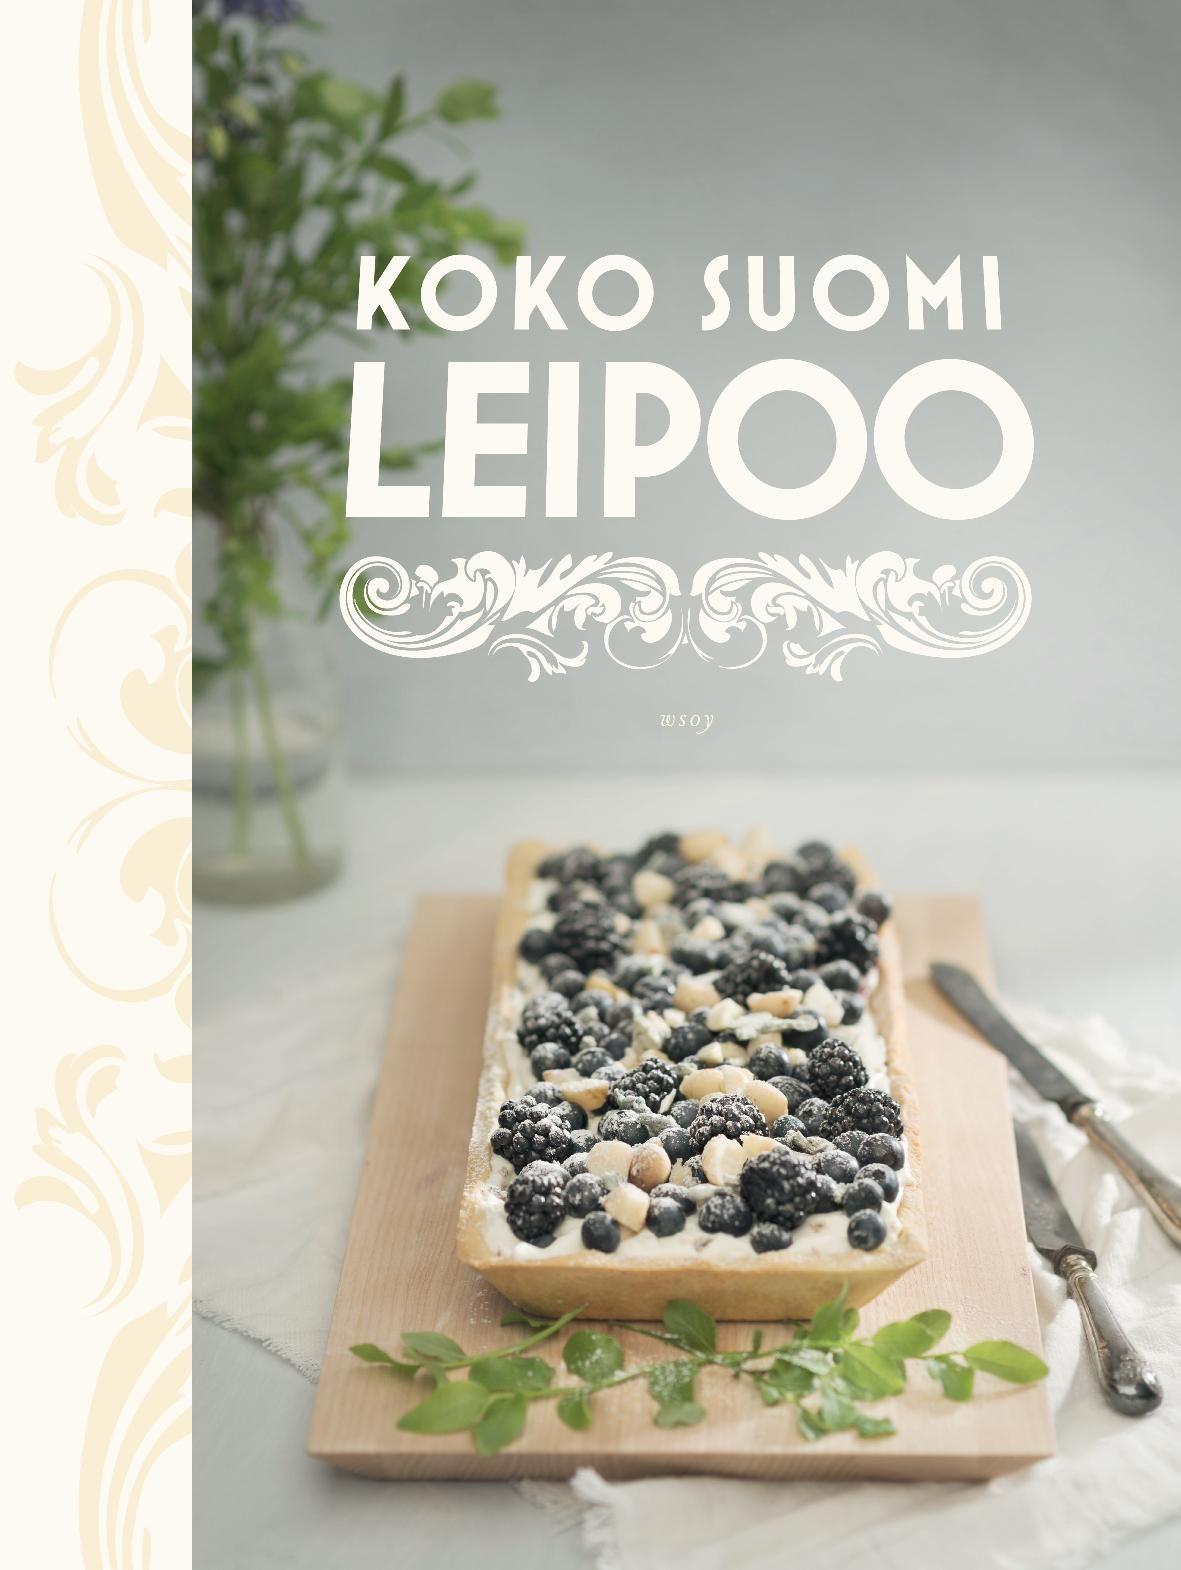 Koko Suomi leipoo - #kirja